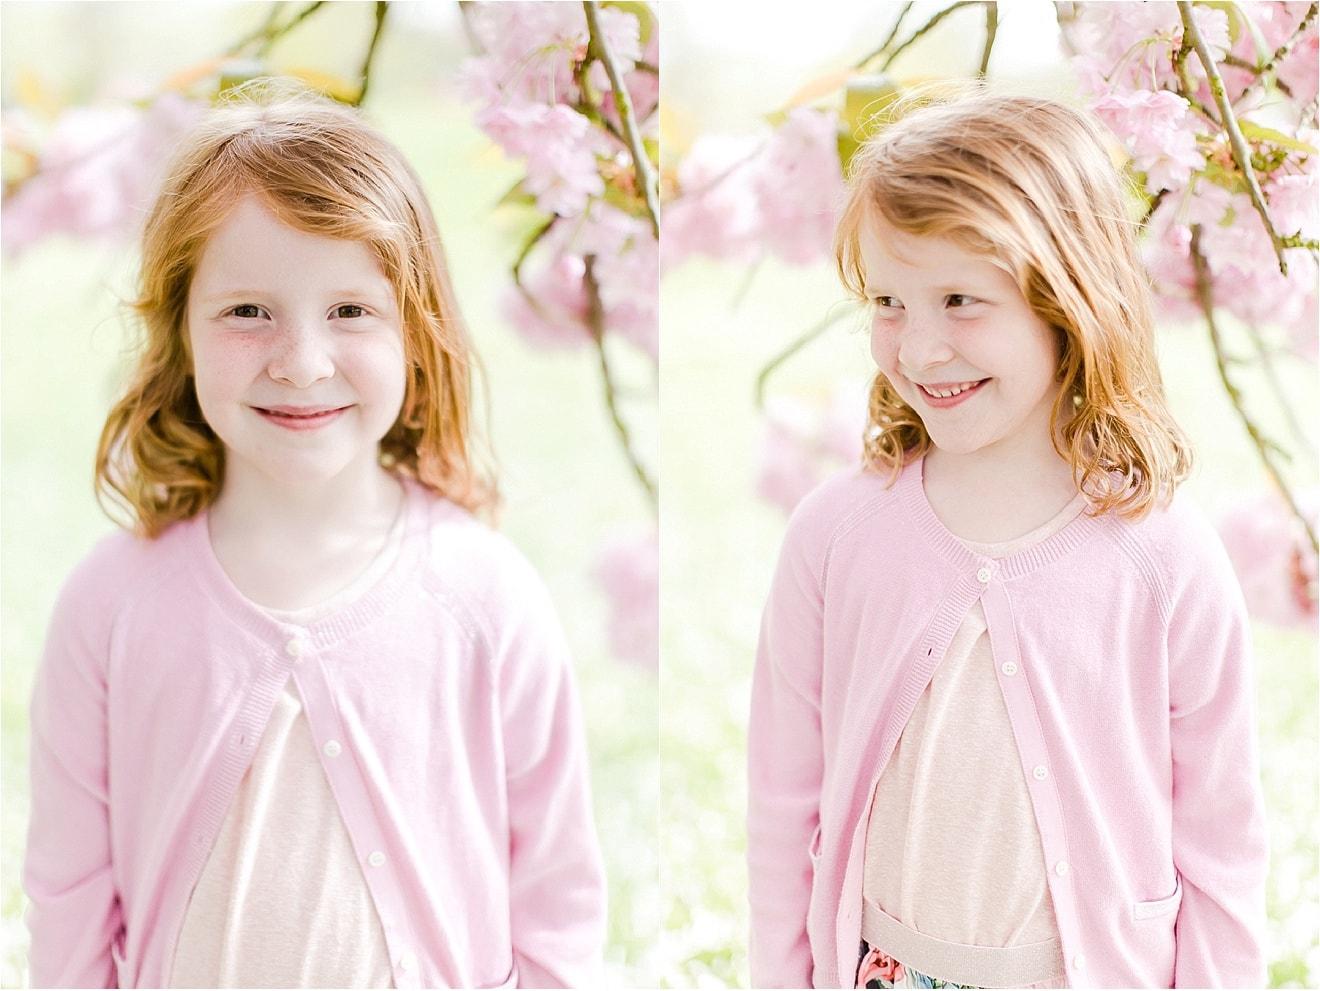 Eddie-Judd-Family-Portrait-Photography009